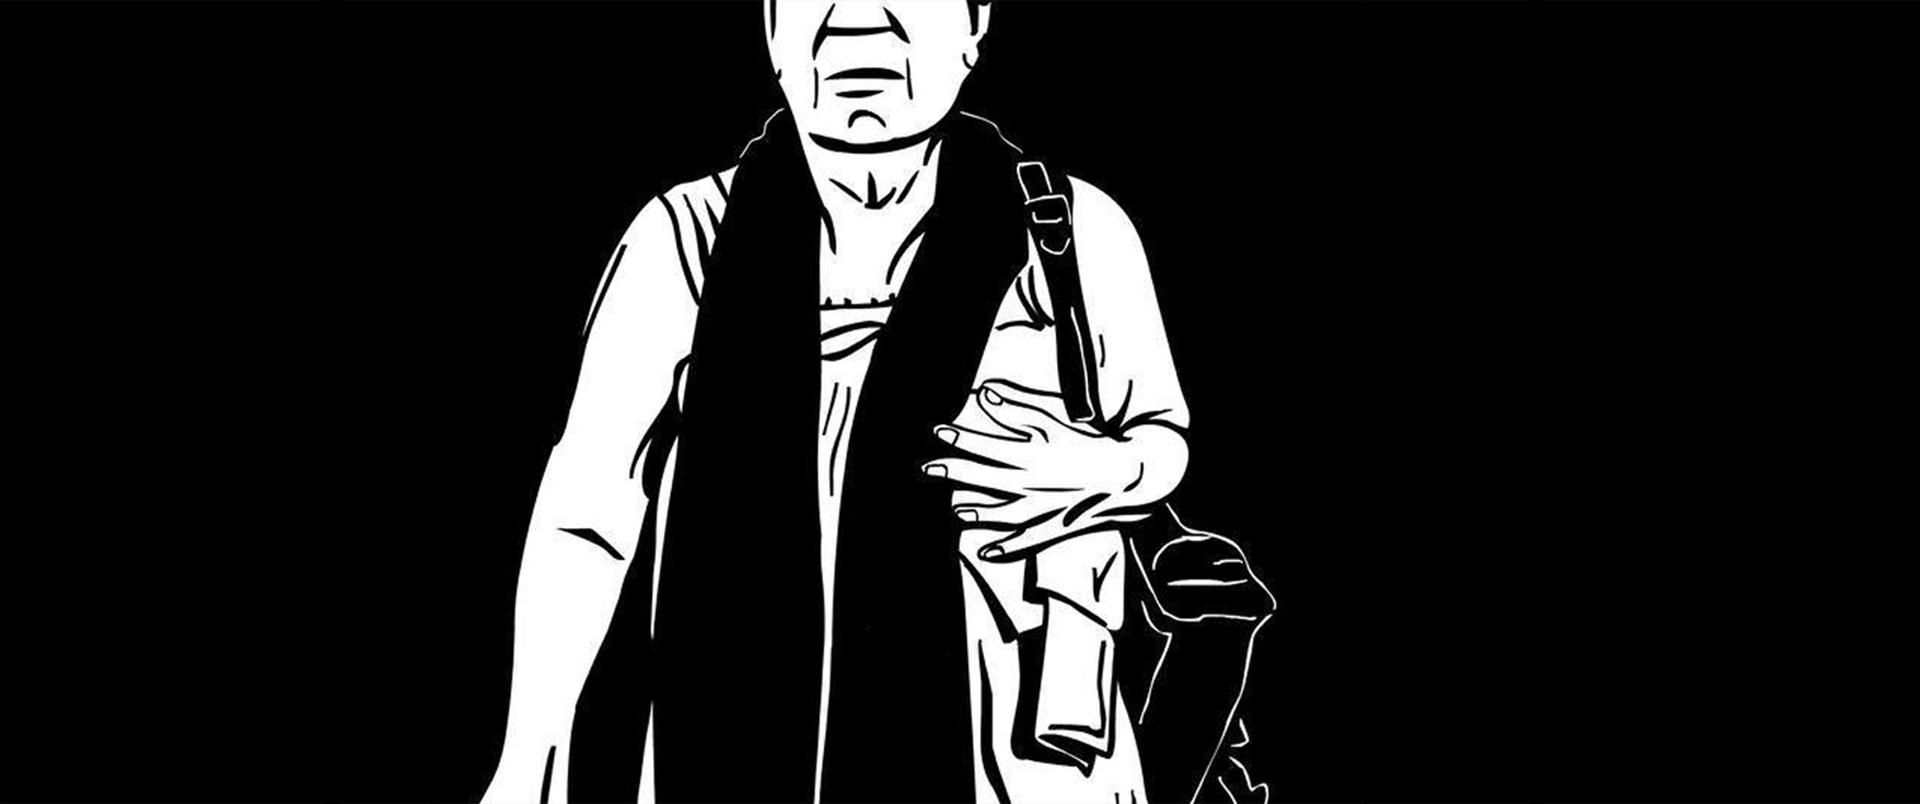 Critique – Manang Biring